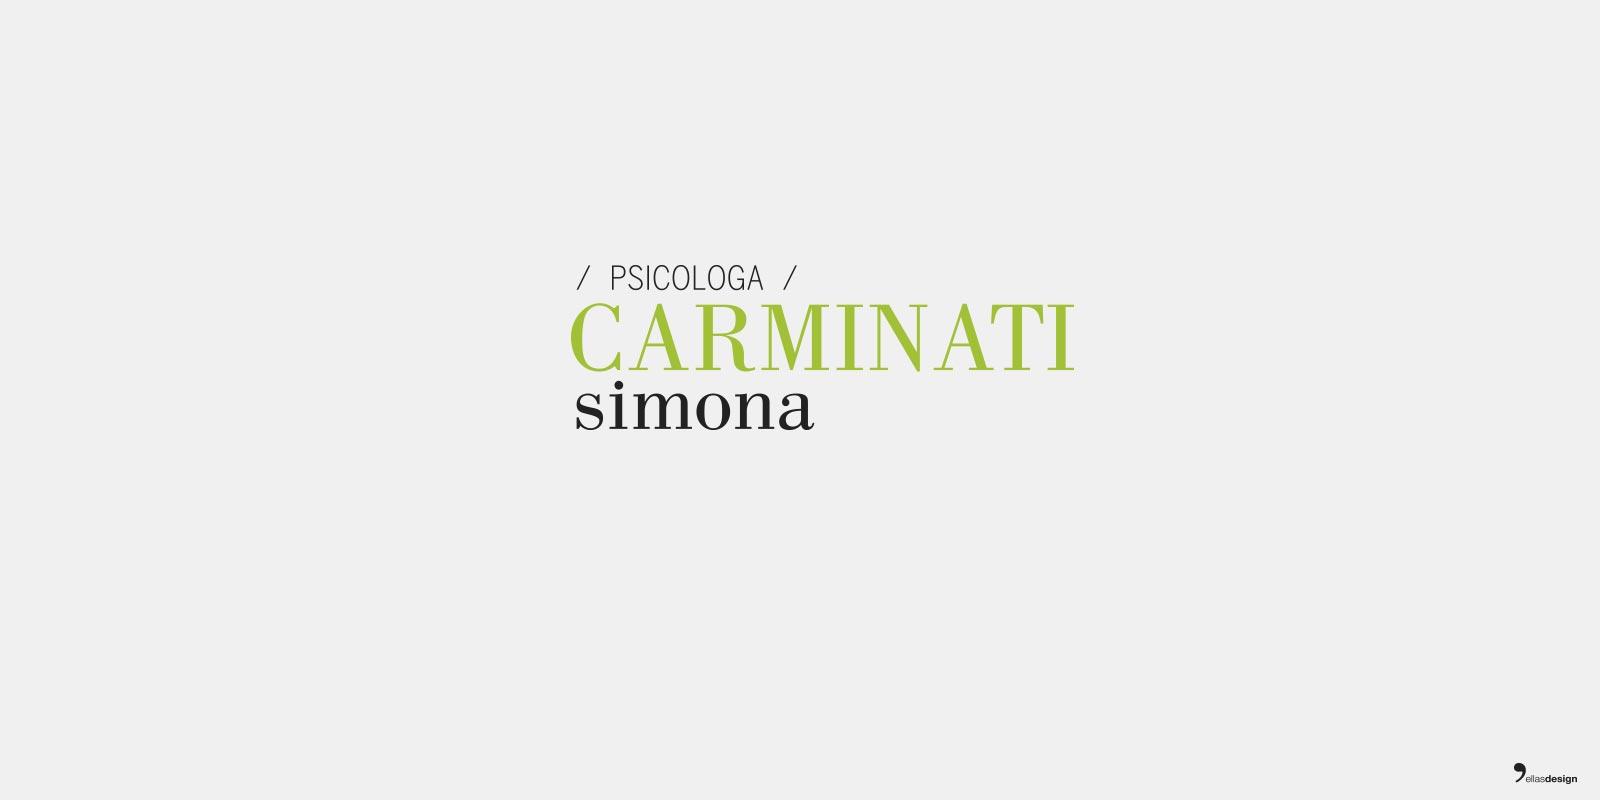 Carminati Simona Psicologa